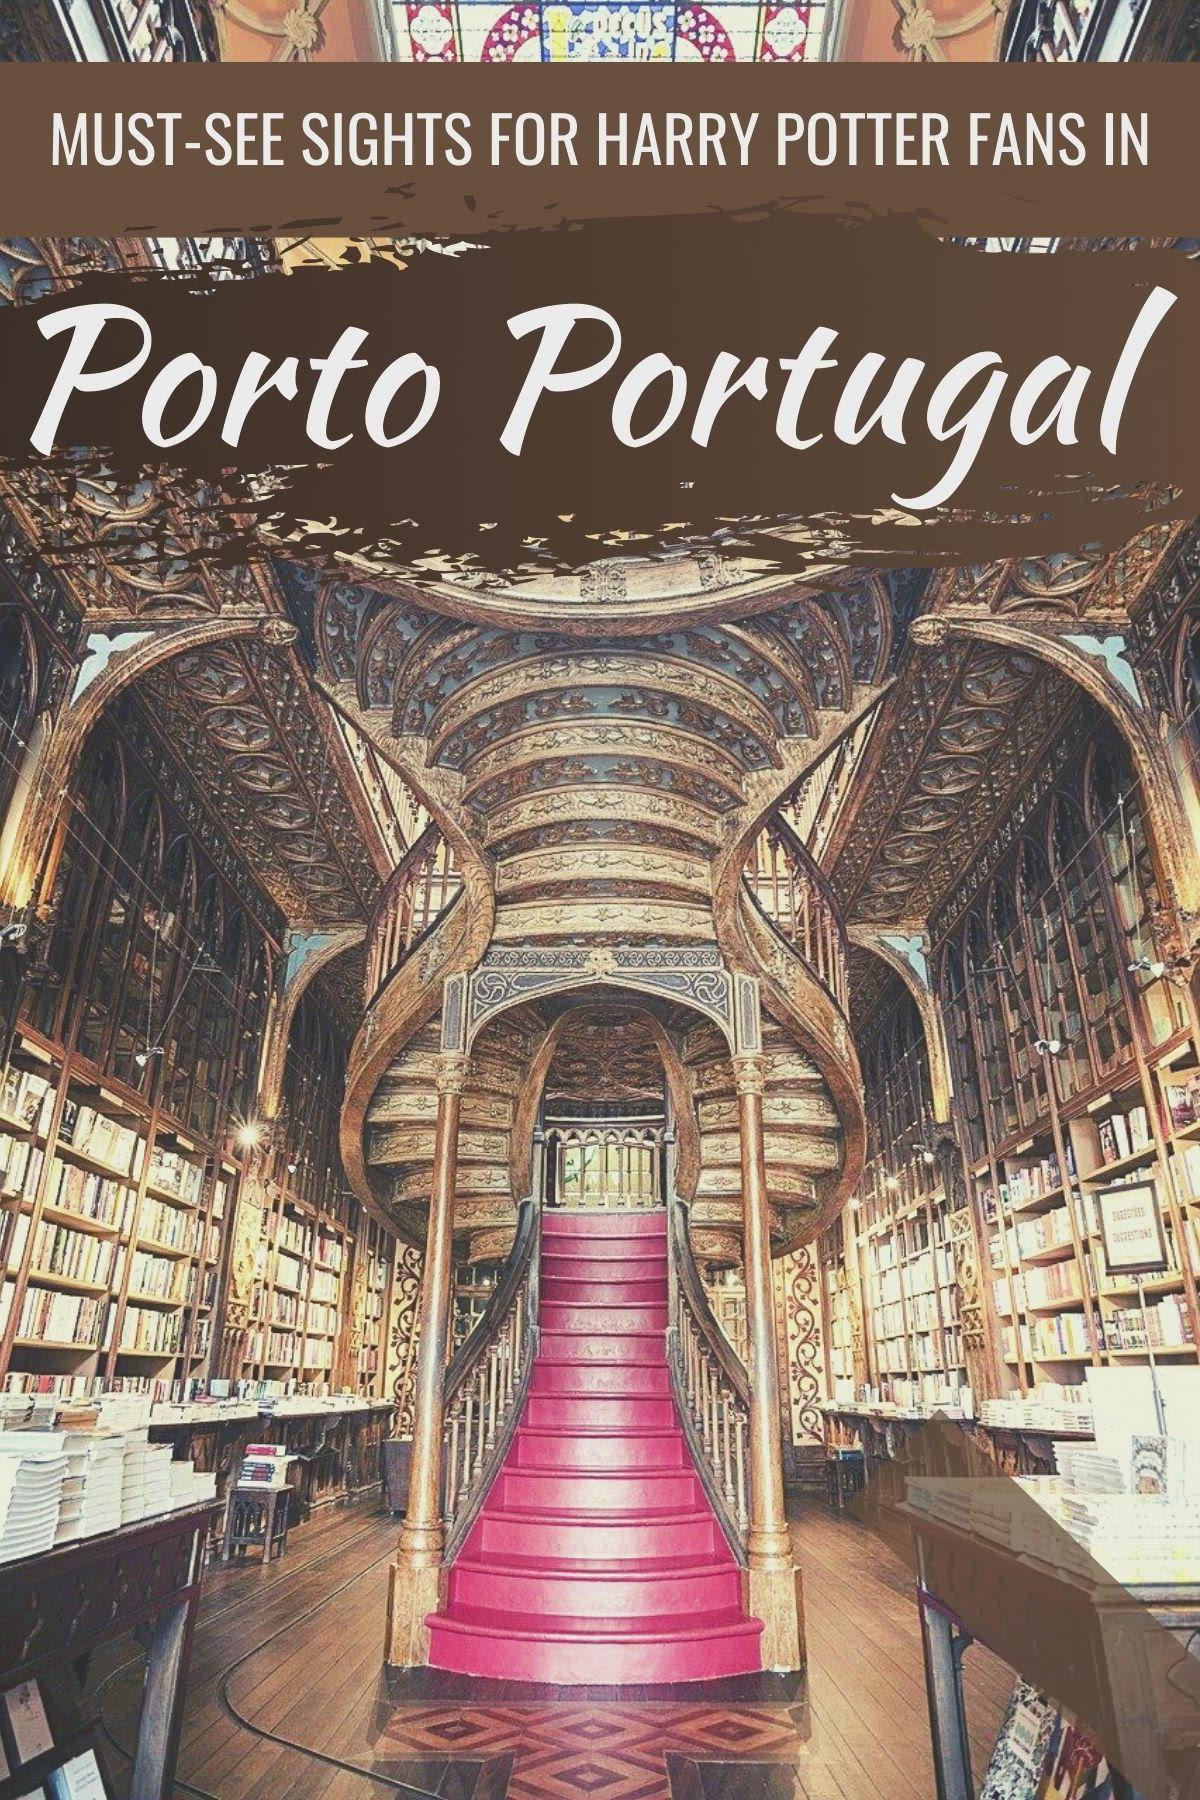 Harry Potter Porto The Jk Rowling Porto Portugal Connection Video Video In 2021 Porto Porto Portugal Beautiful Places To Visit